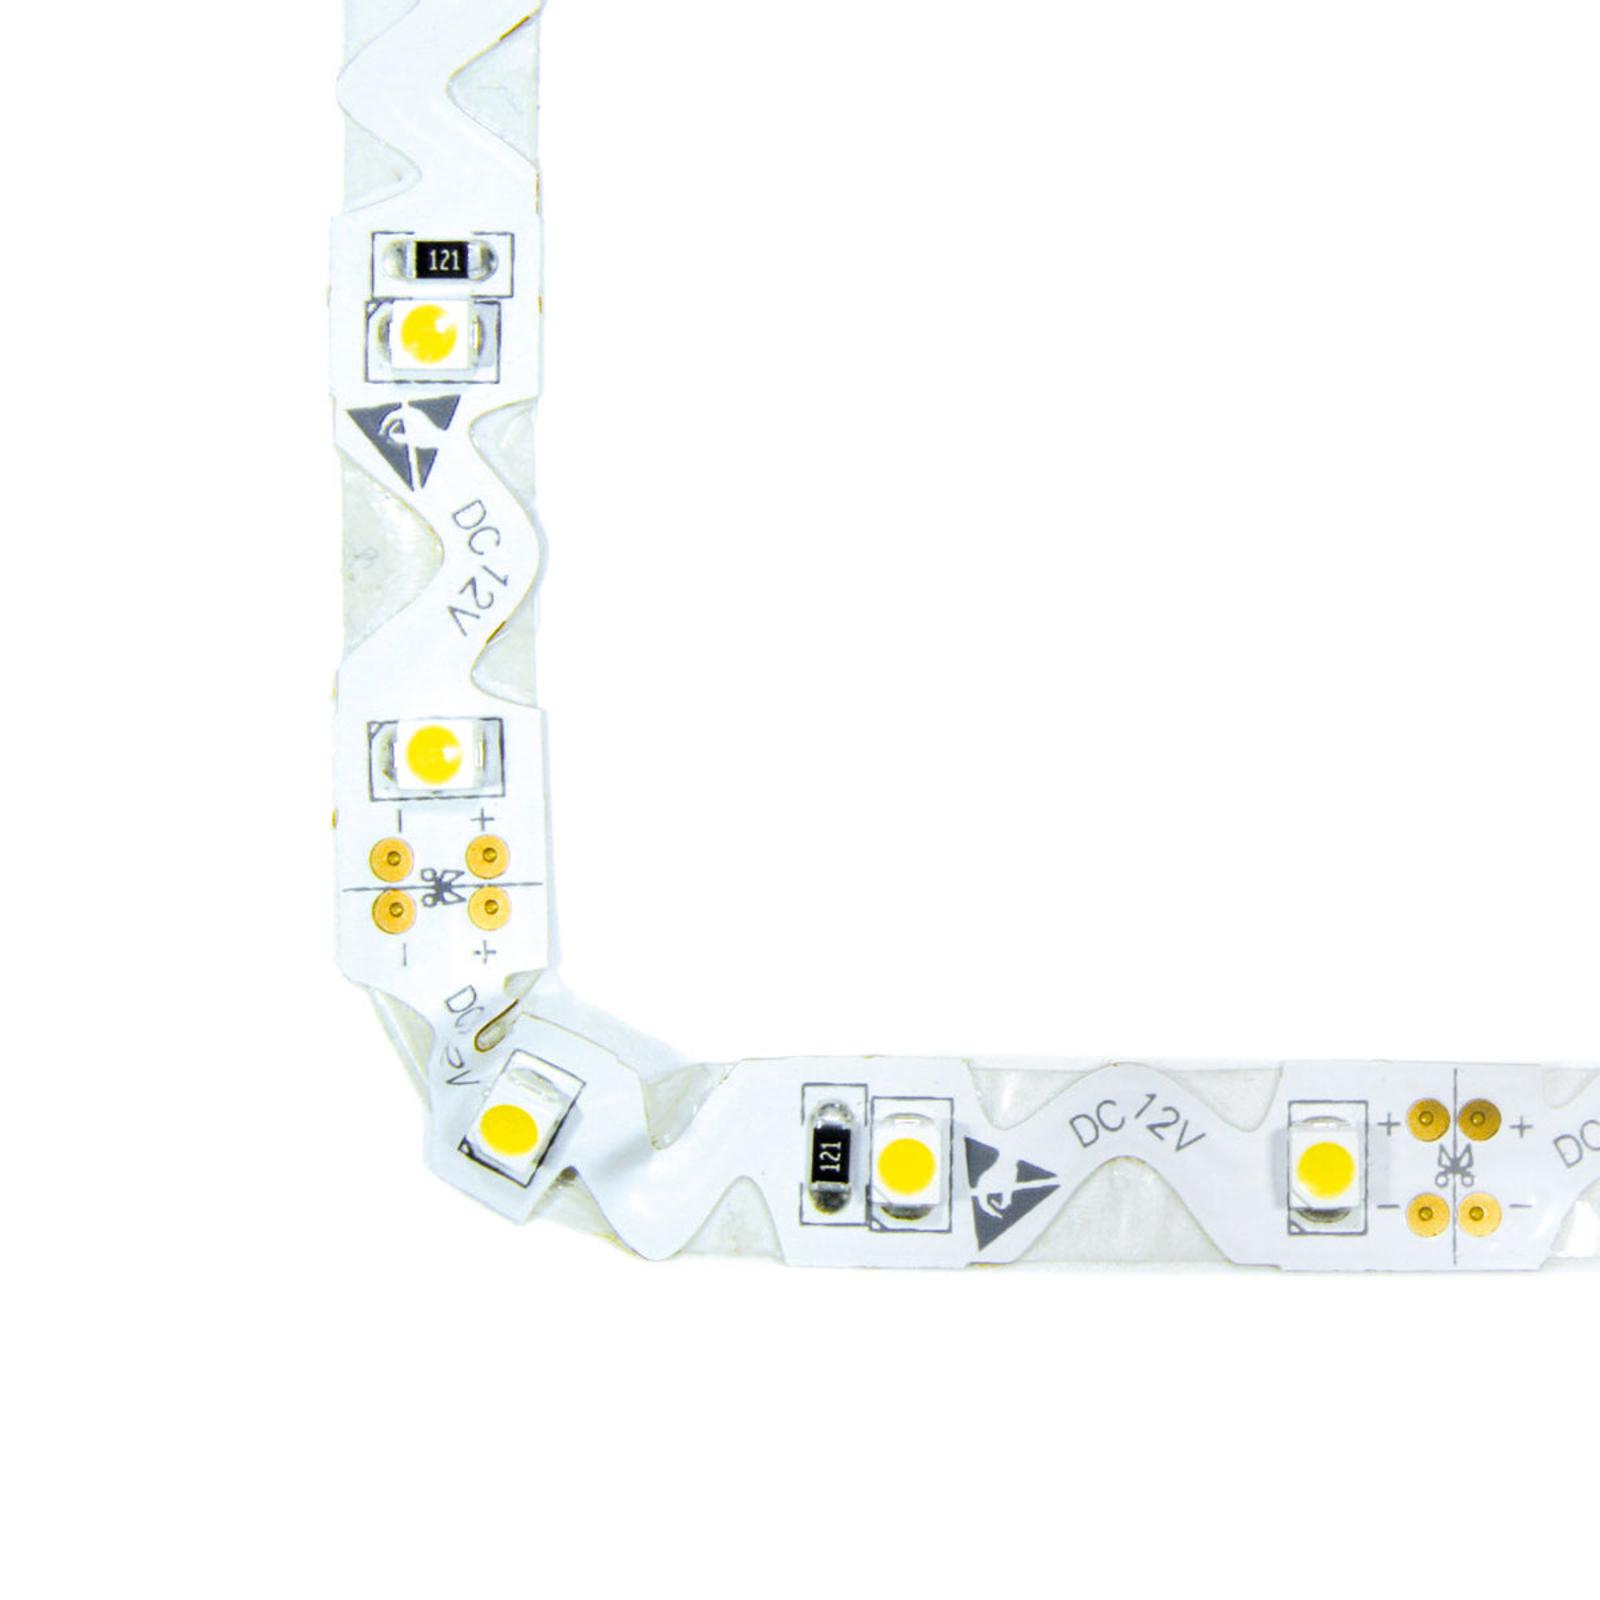 LED flex strip with a warm white luminous colour